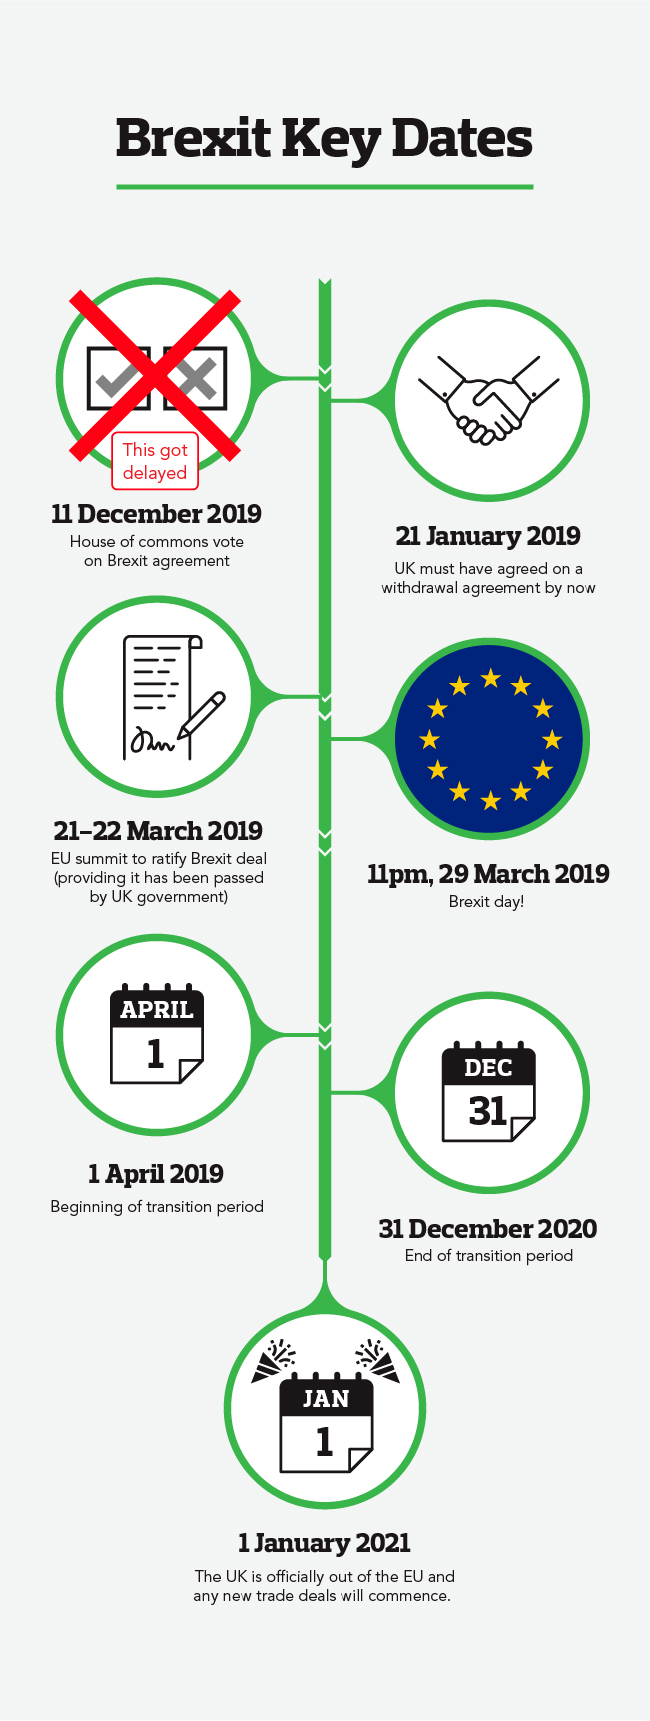 Brexit key dates